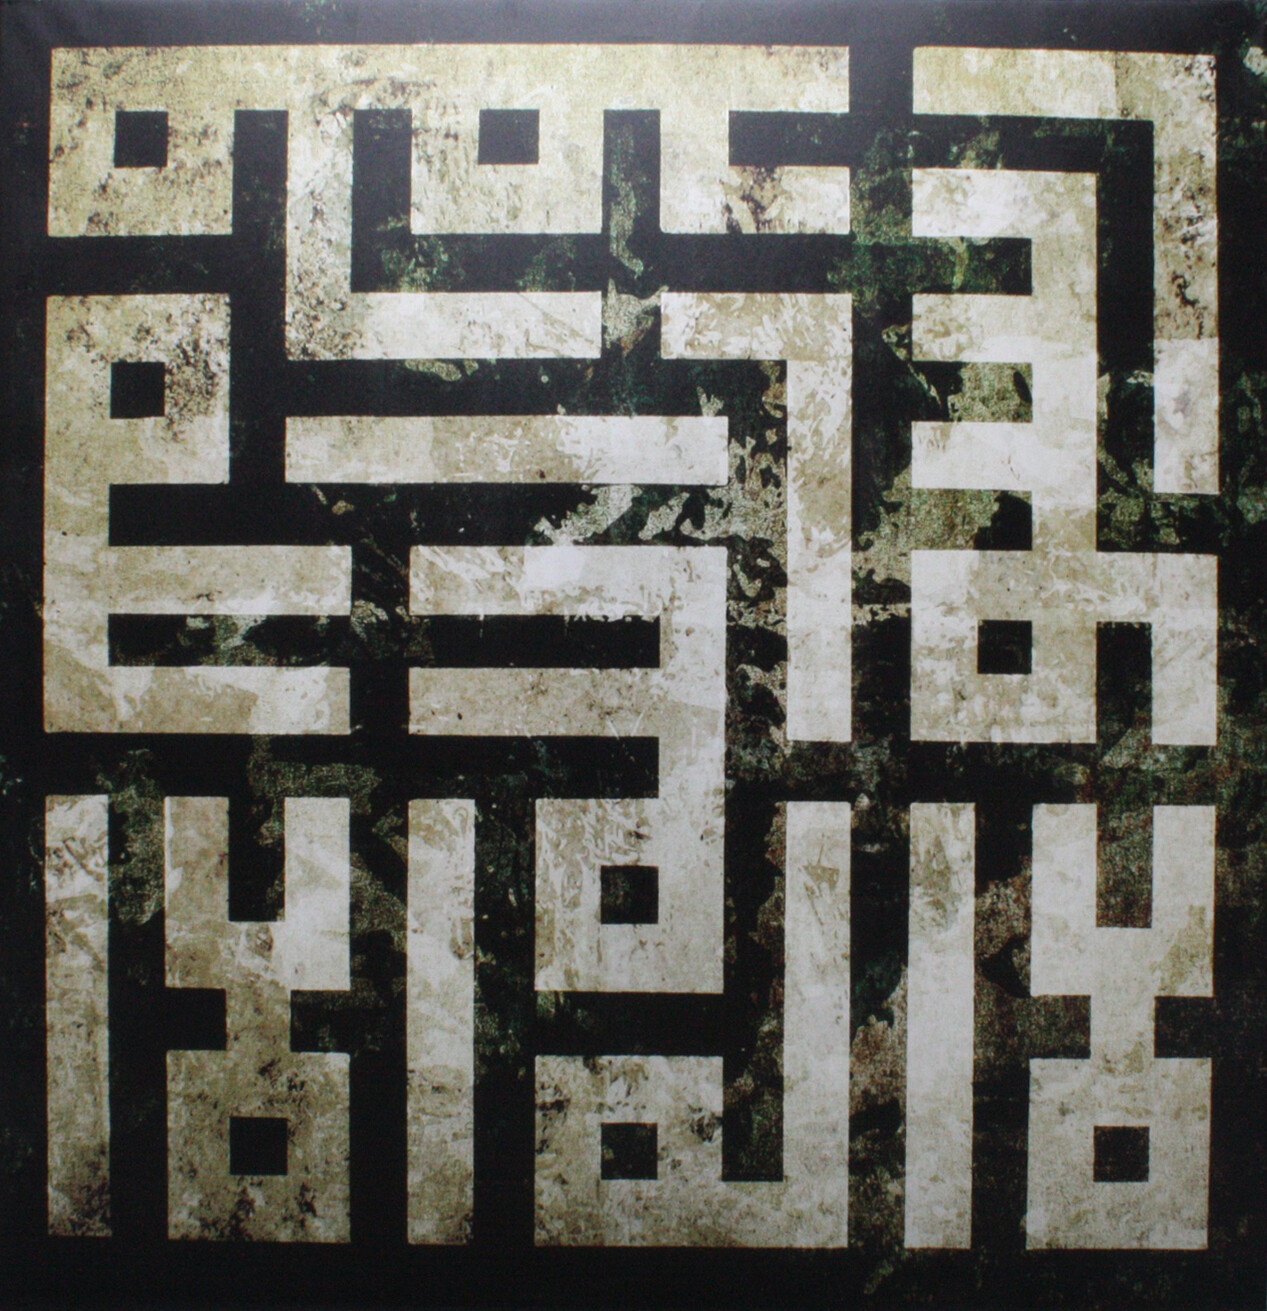 Shahaada Kufic Abstract Khaki Design Original Giclée Canvas